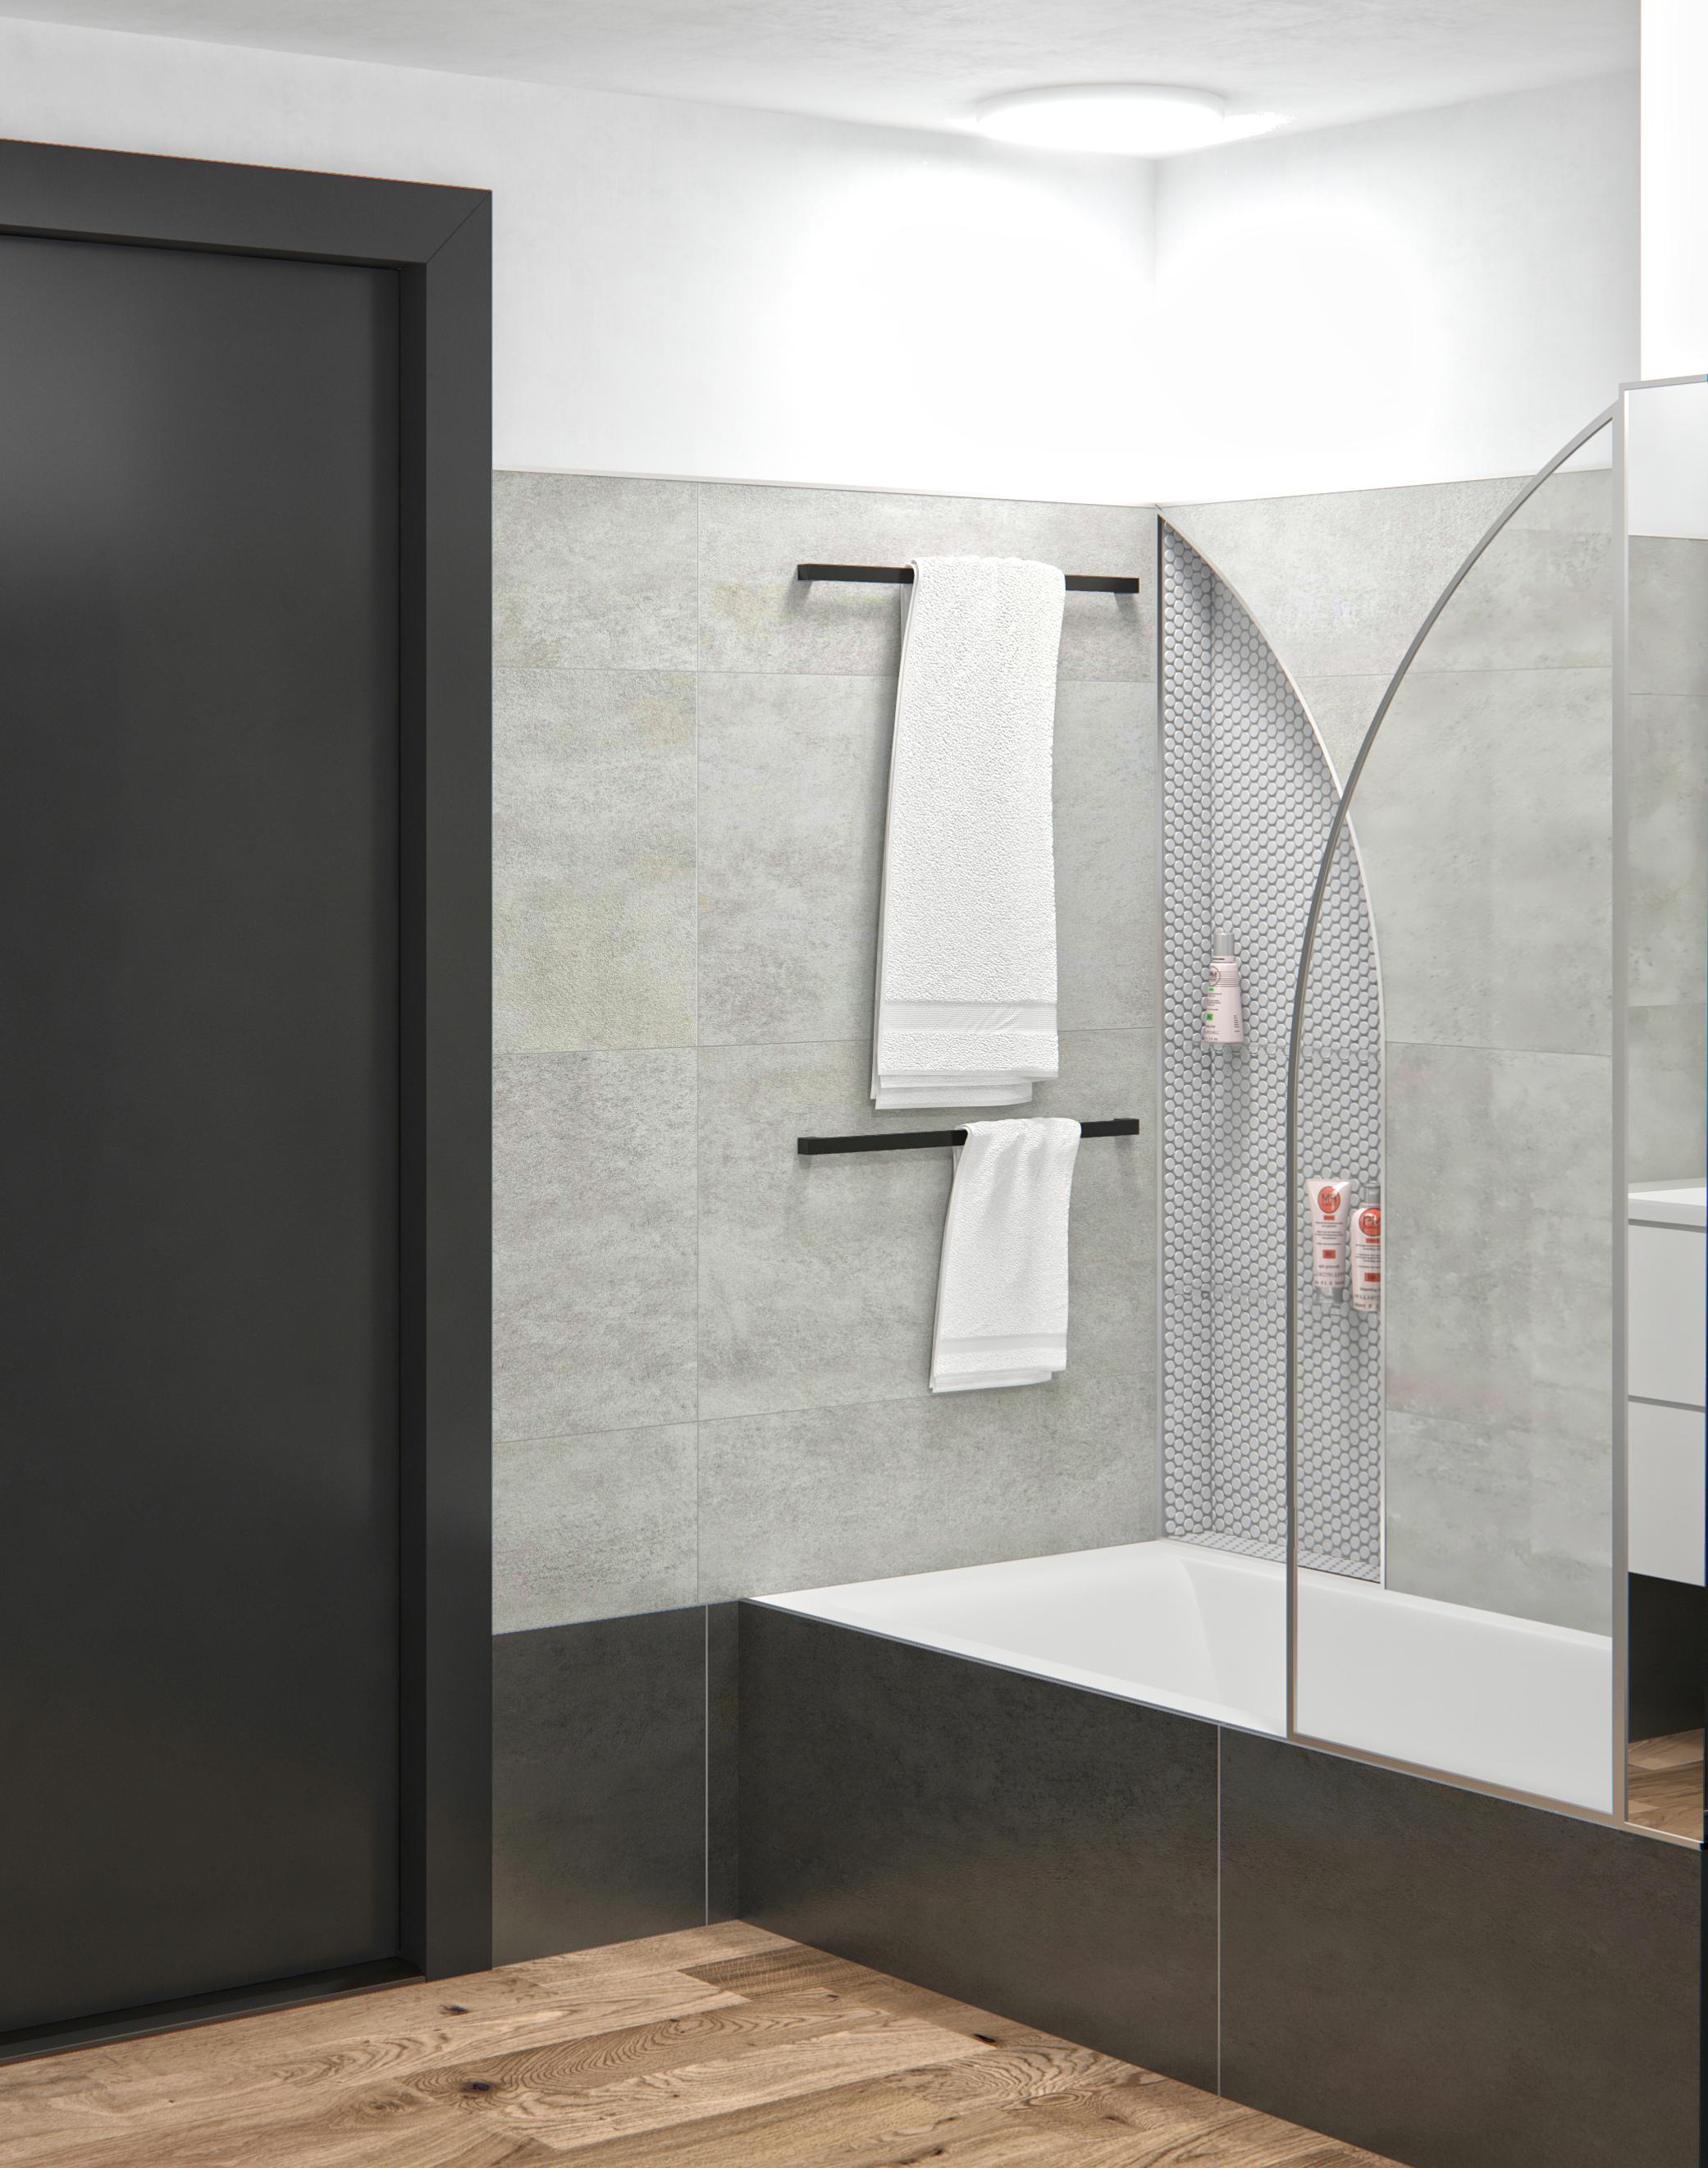 380 MONTGOMERY BATHROOM 3.jpg